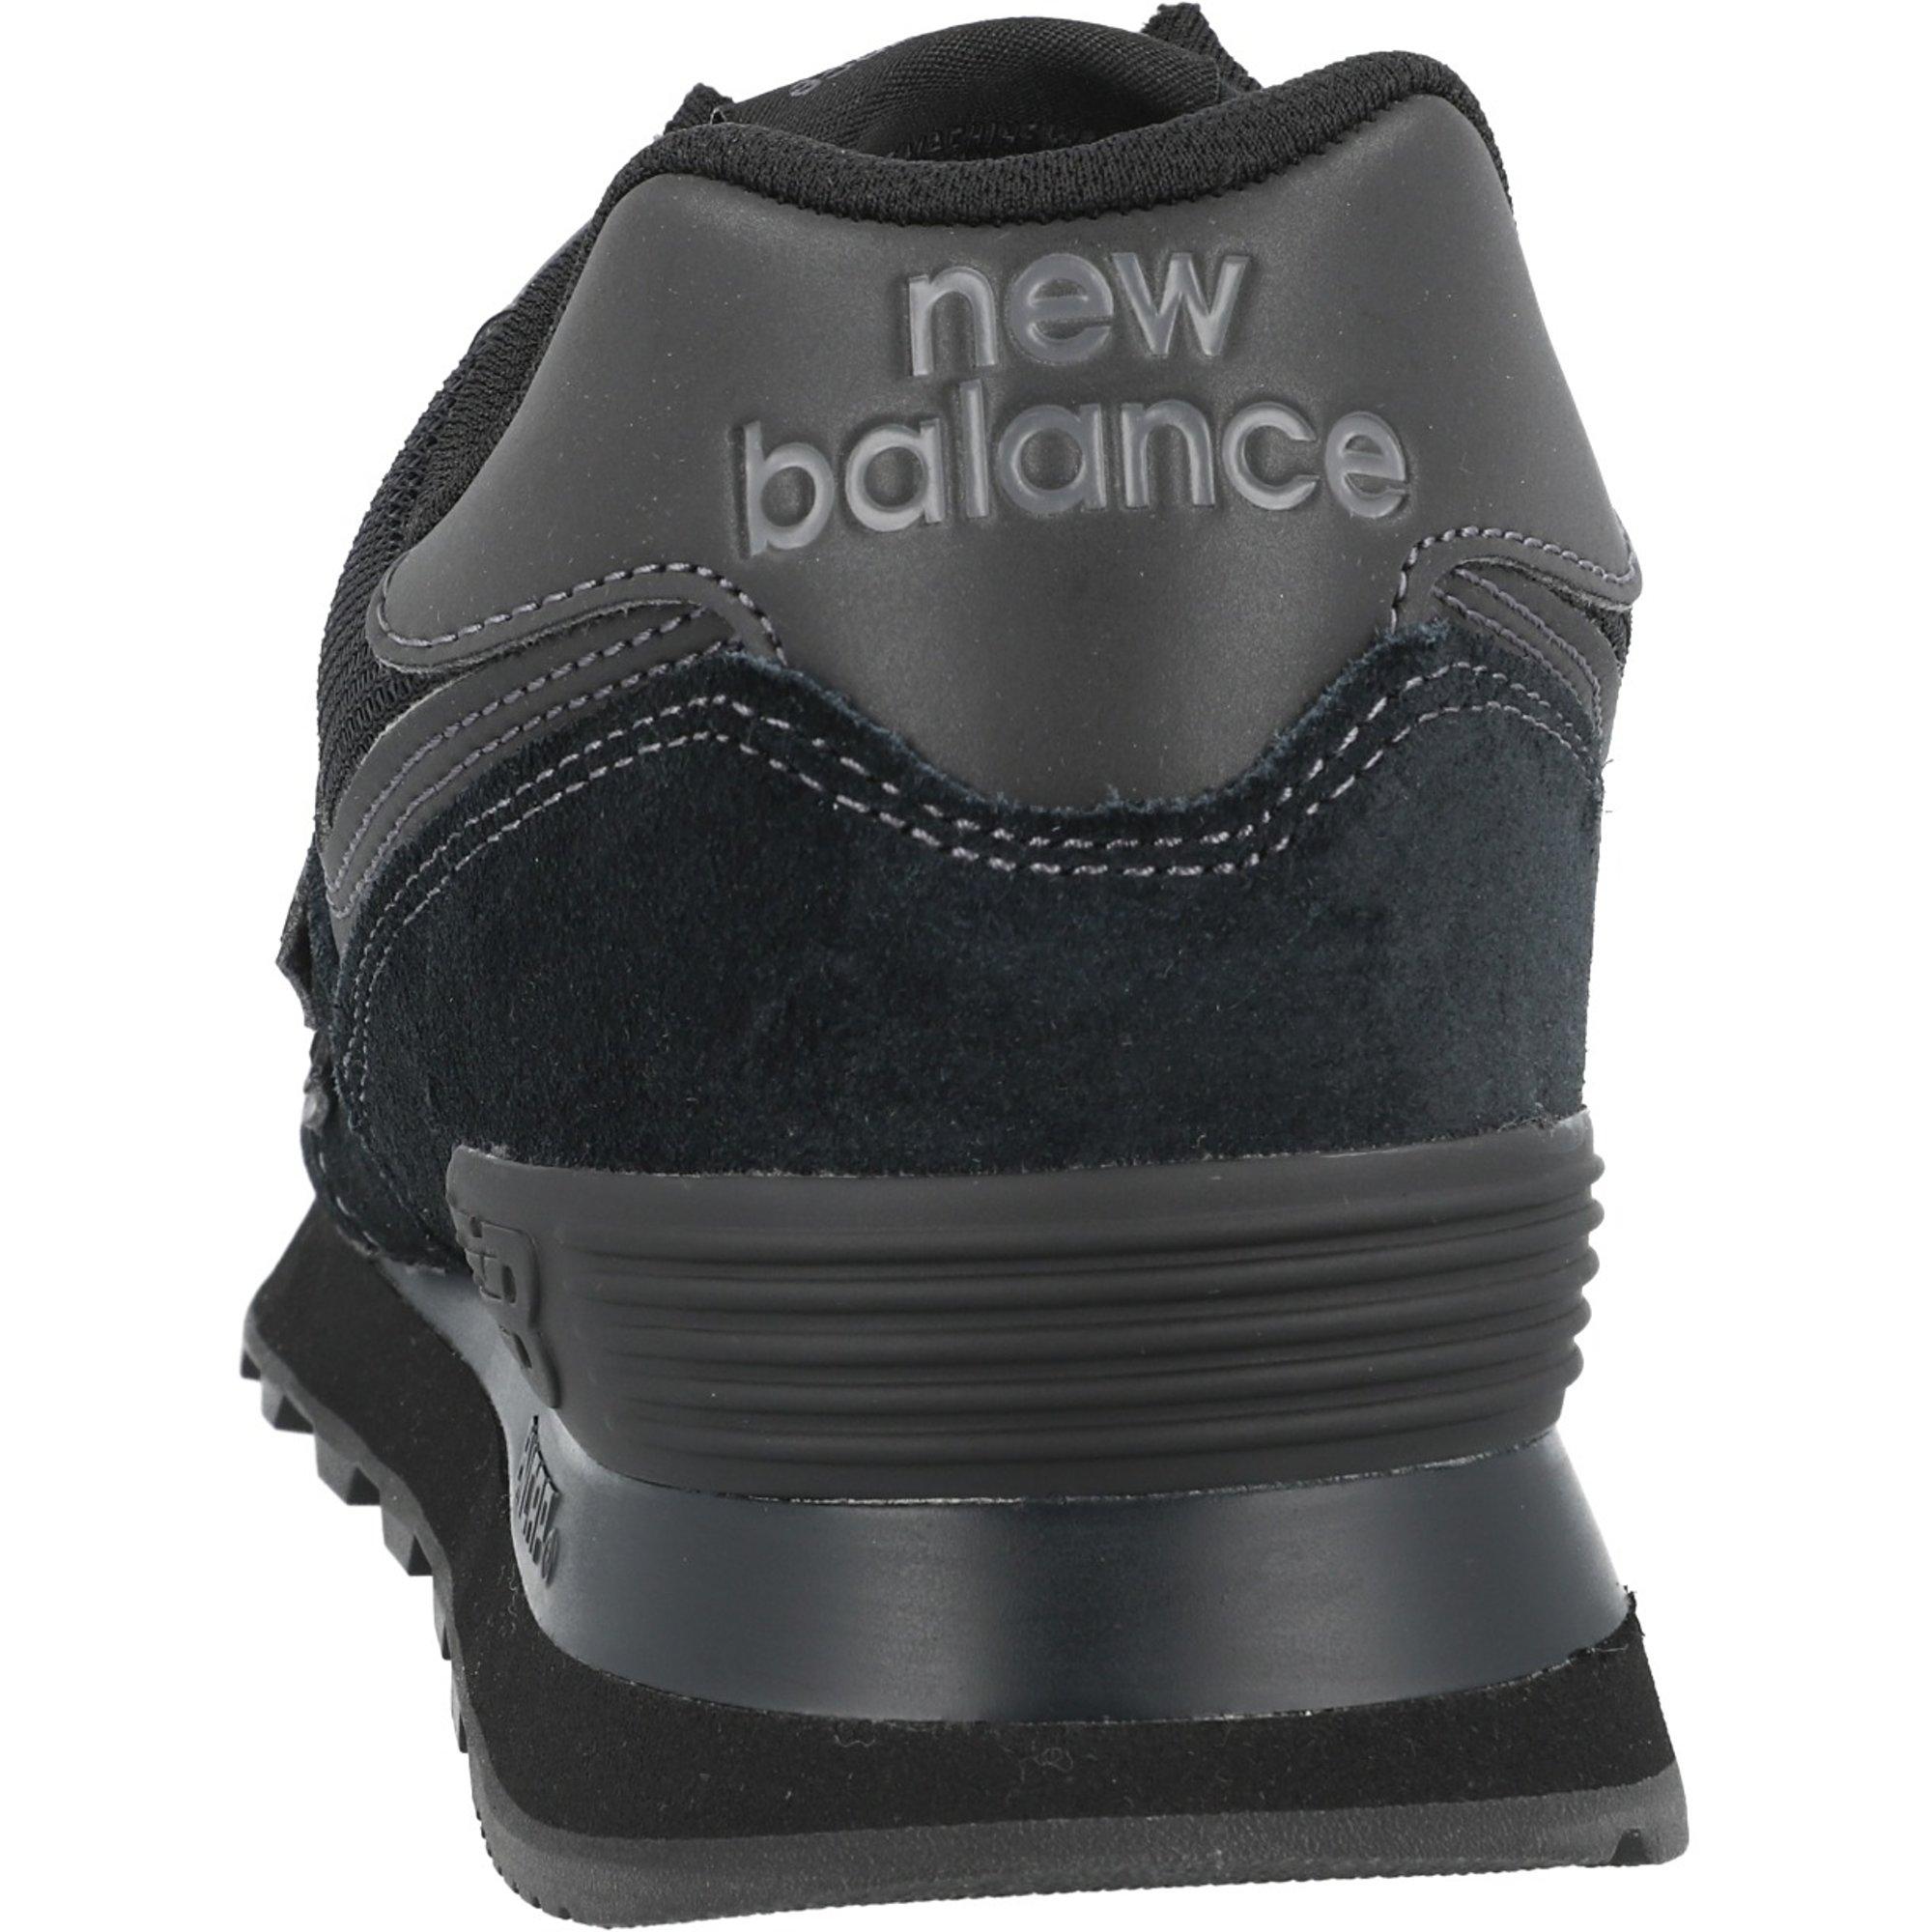 New Balance 574 Black Suede